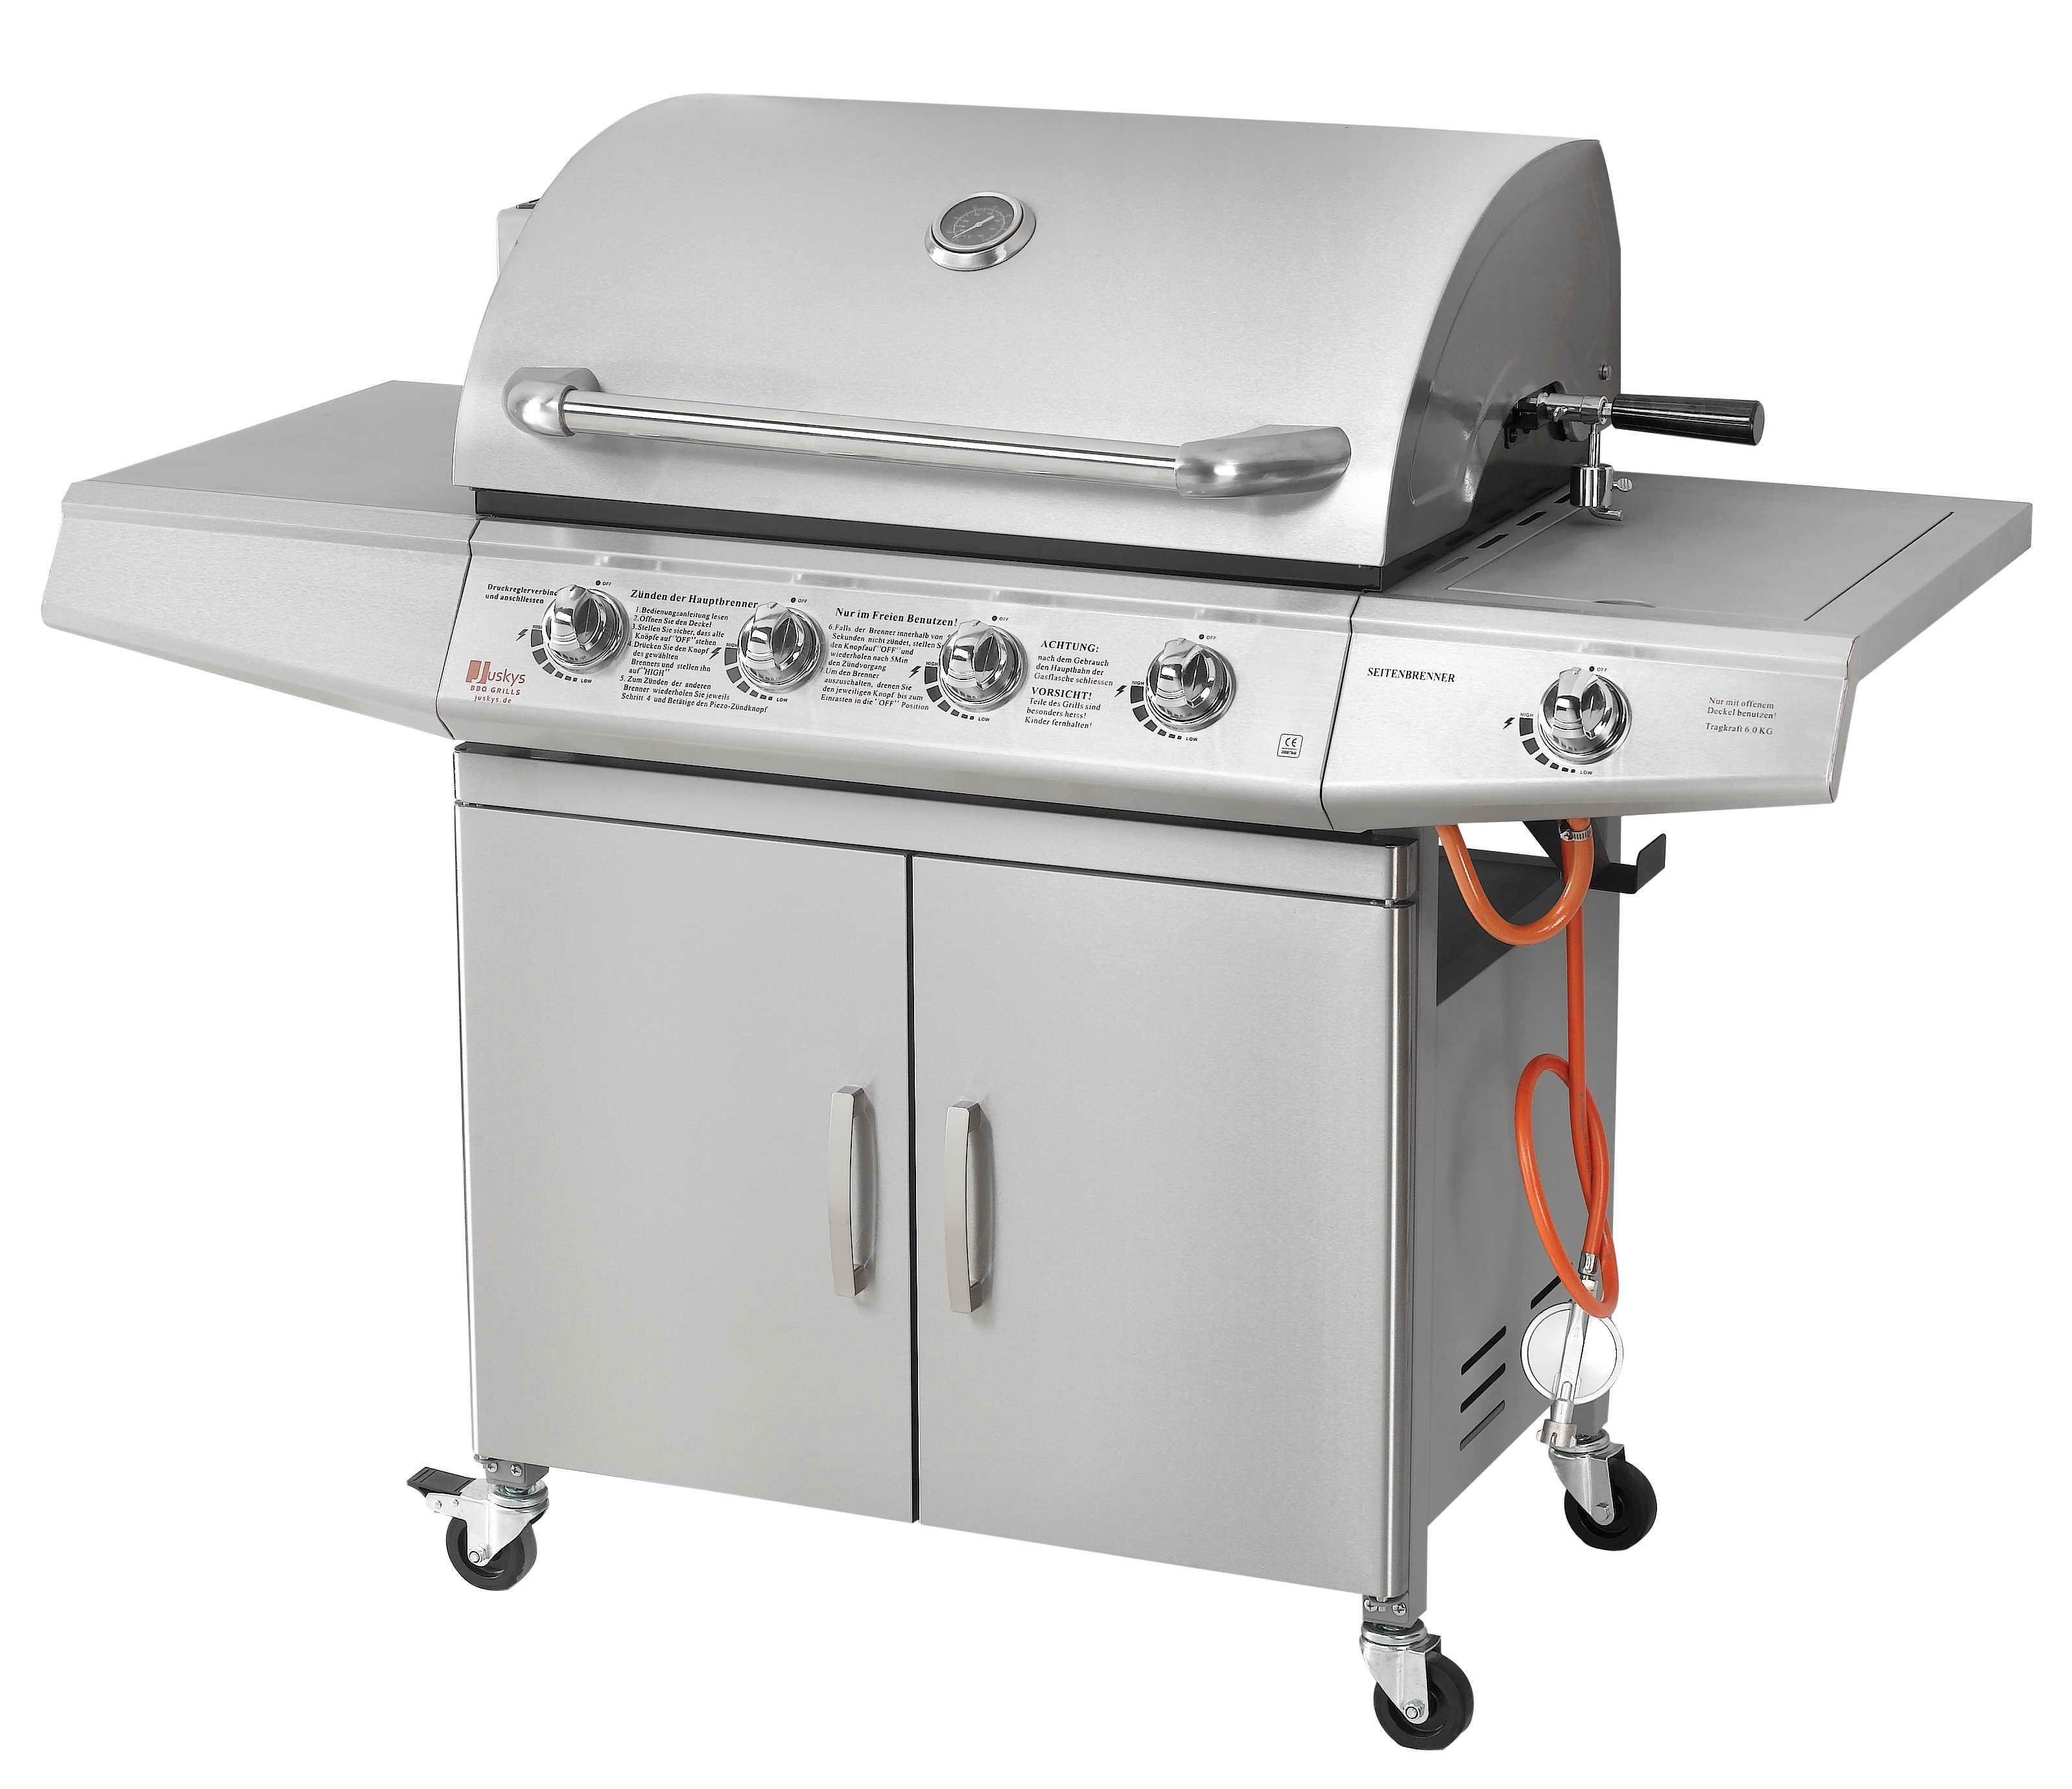 Bbq gasgrill edelstahl gas grill grillwagen barbecue ebay for Weber gasgrill 3 brenner